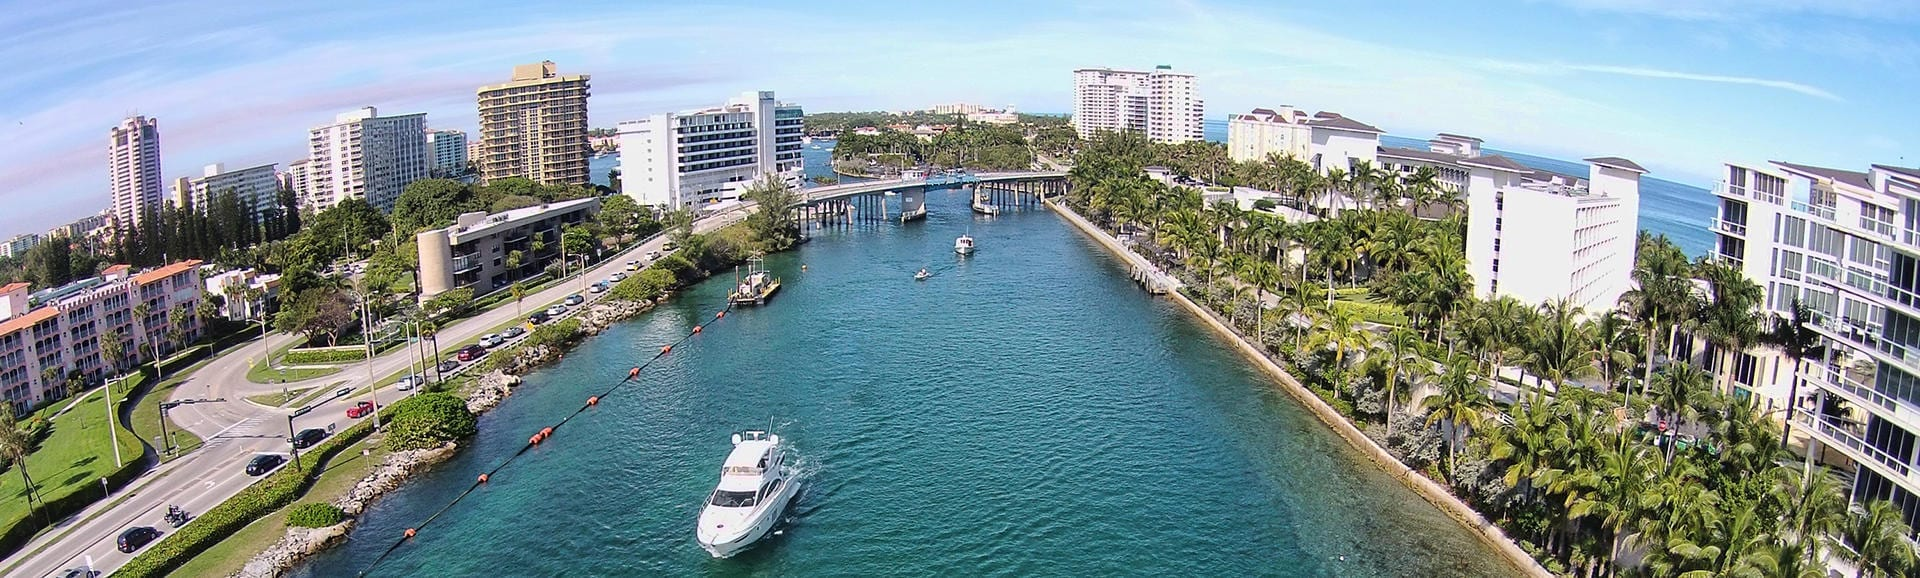 Boca Raton Water way